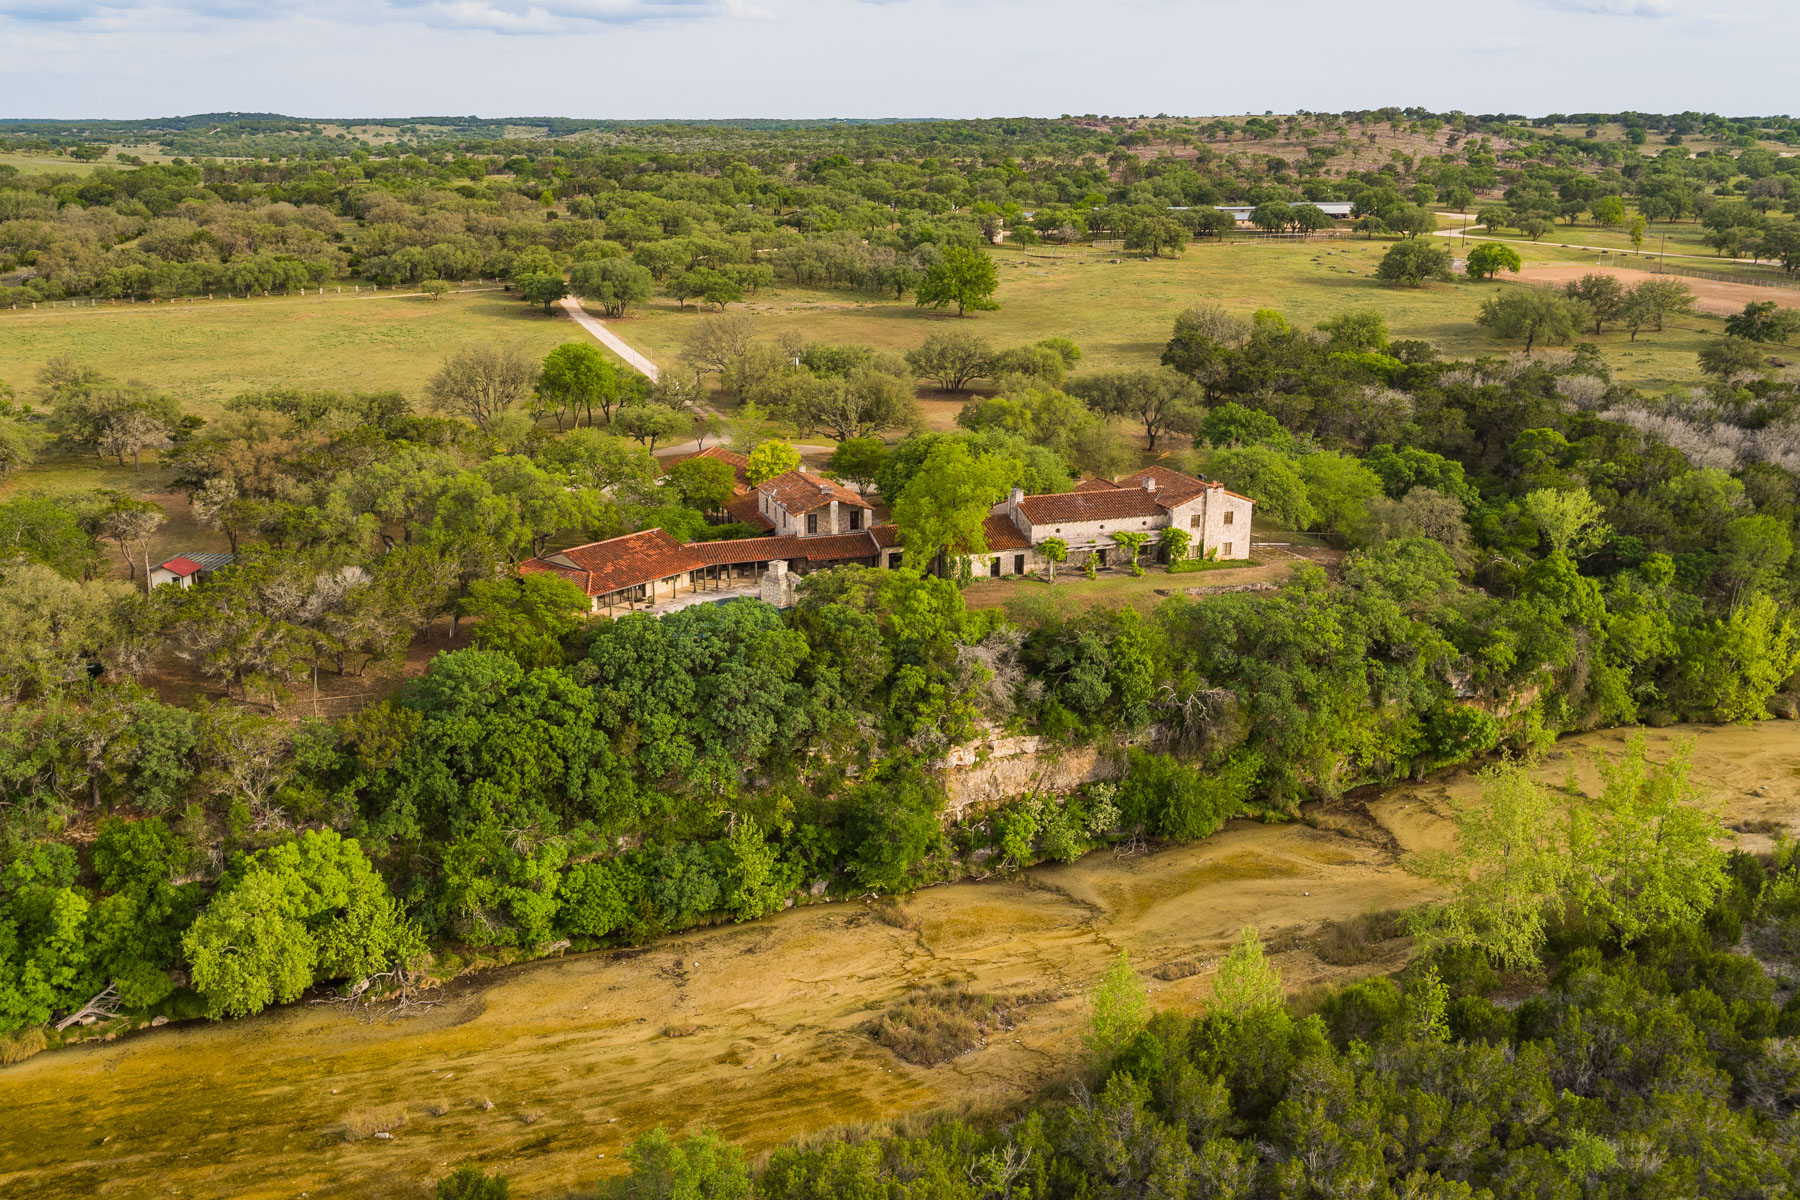 Farm / Ranch / Plantation for Sale at Rio Ranchito 127 100 Shiner Bock Lane, Hunt, Texas 78024 United States